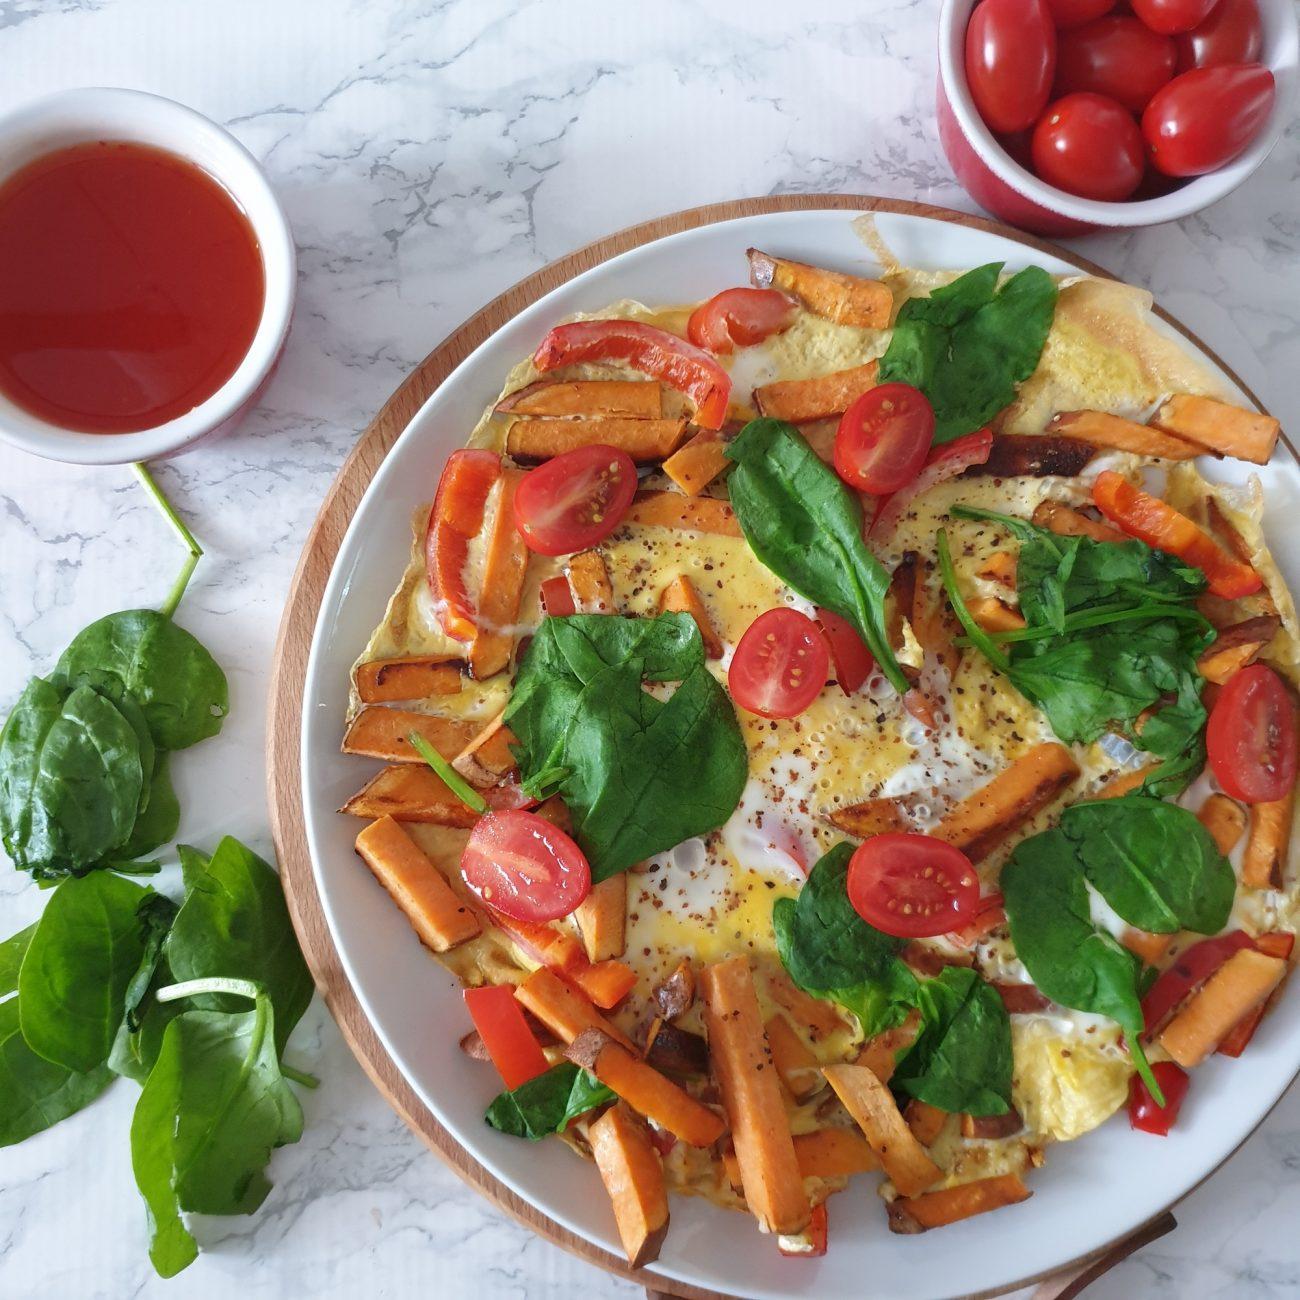 Groenten omelet